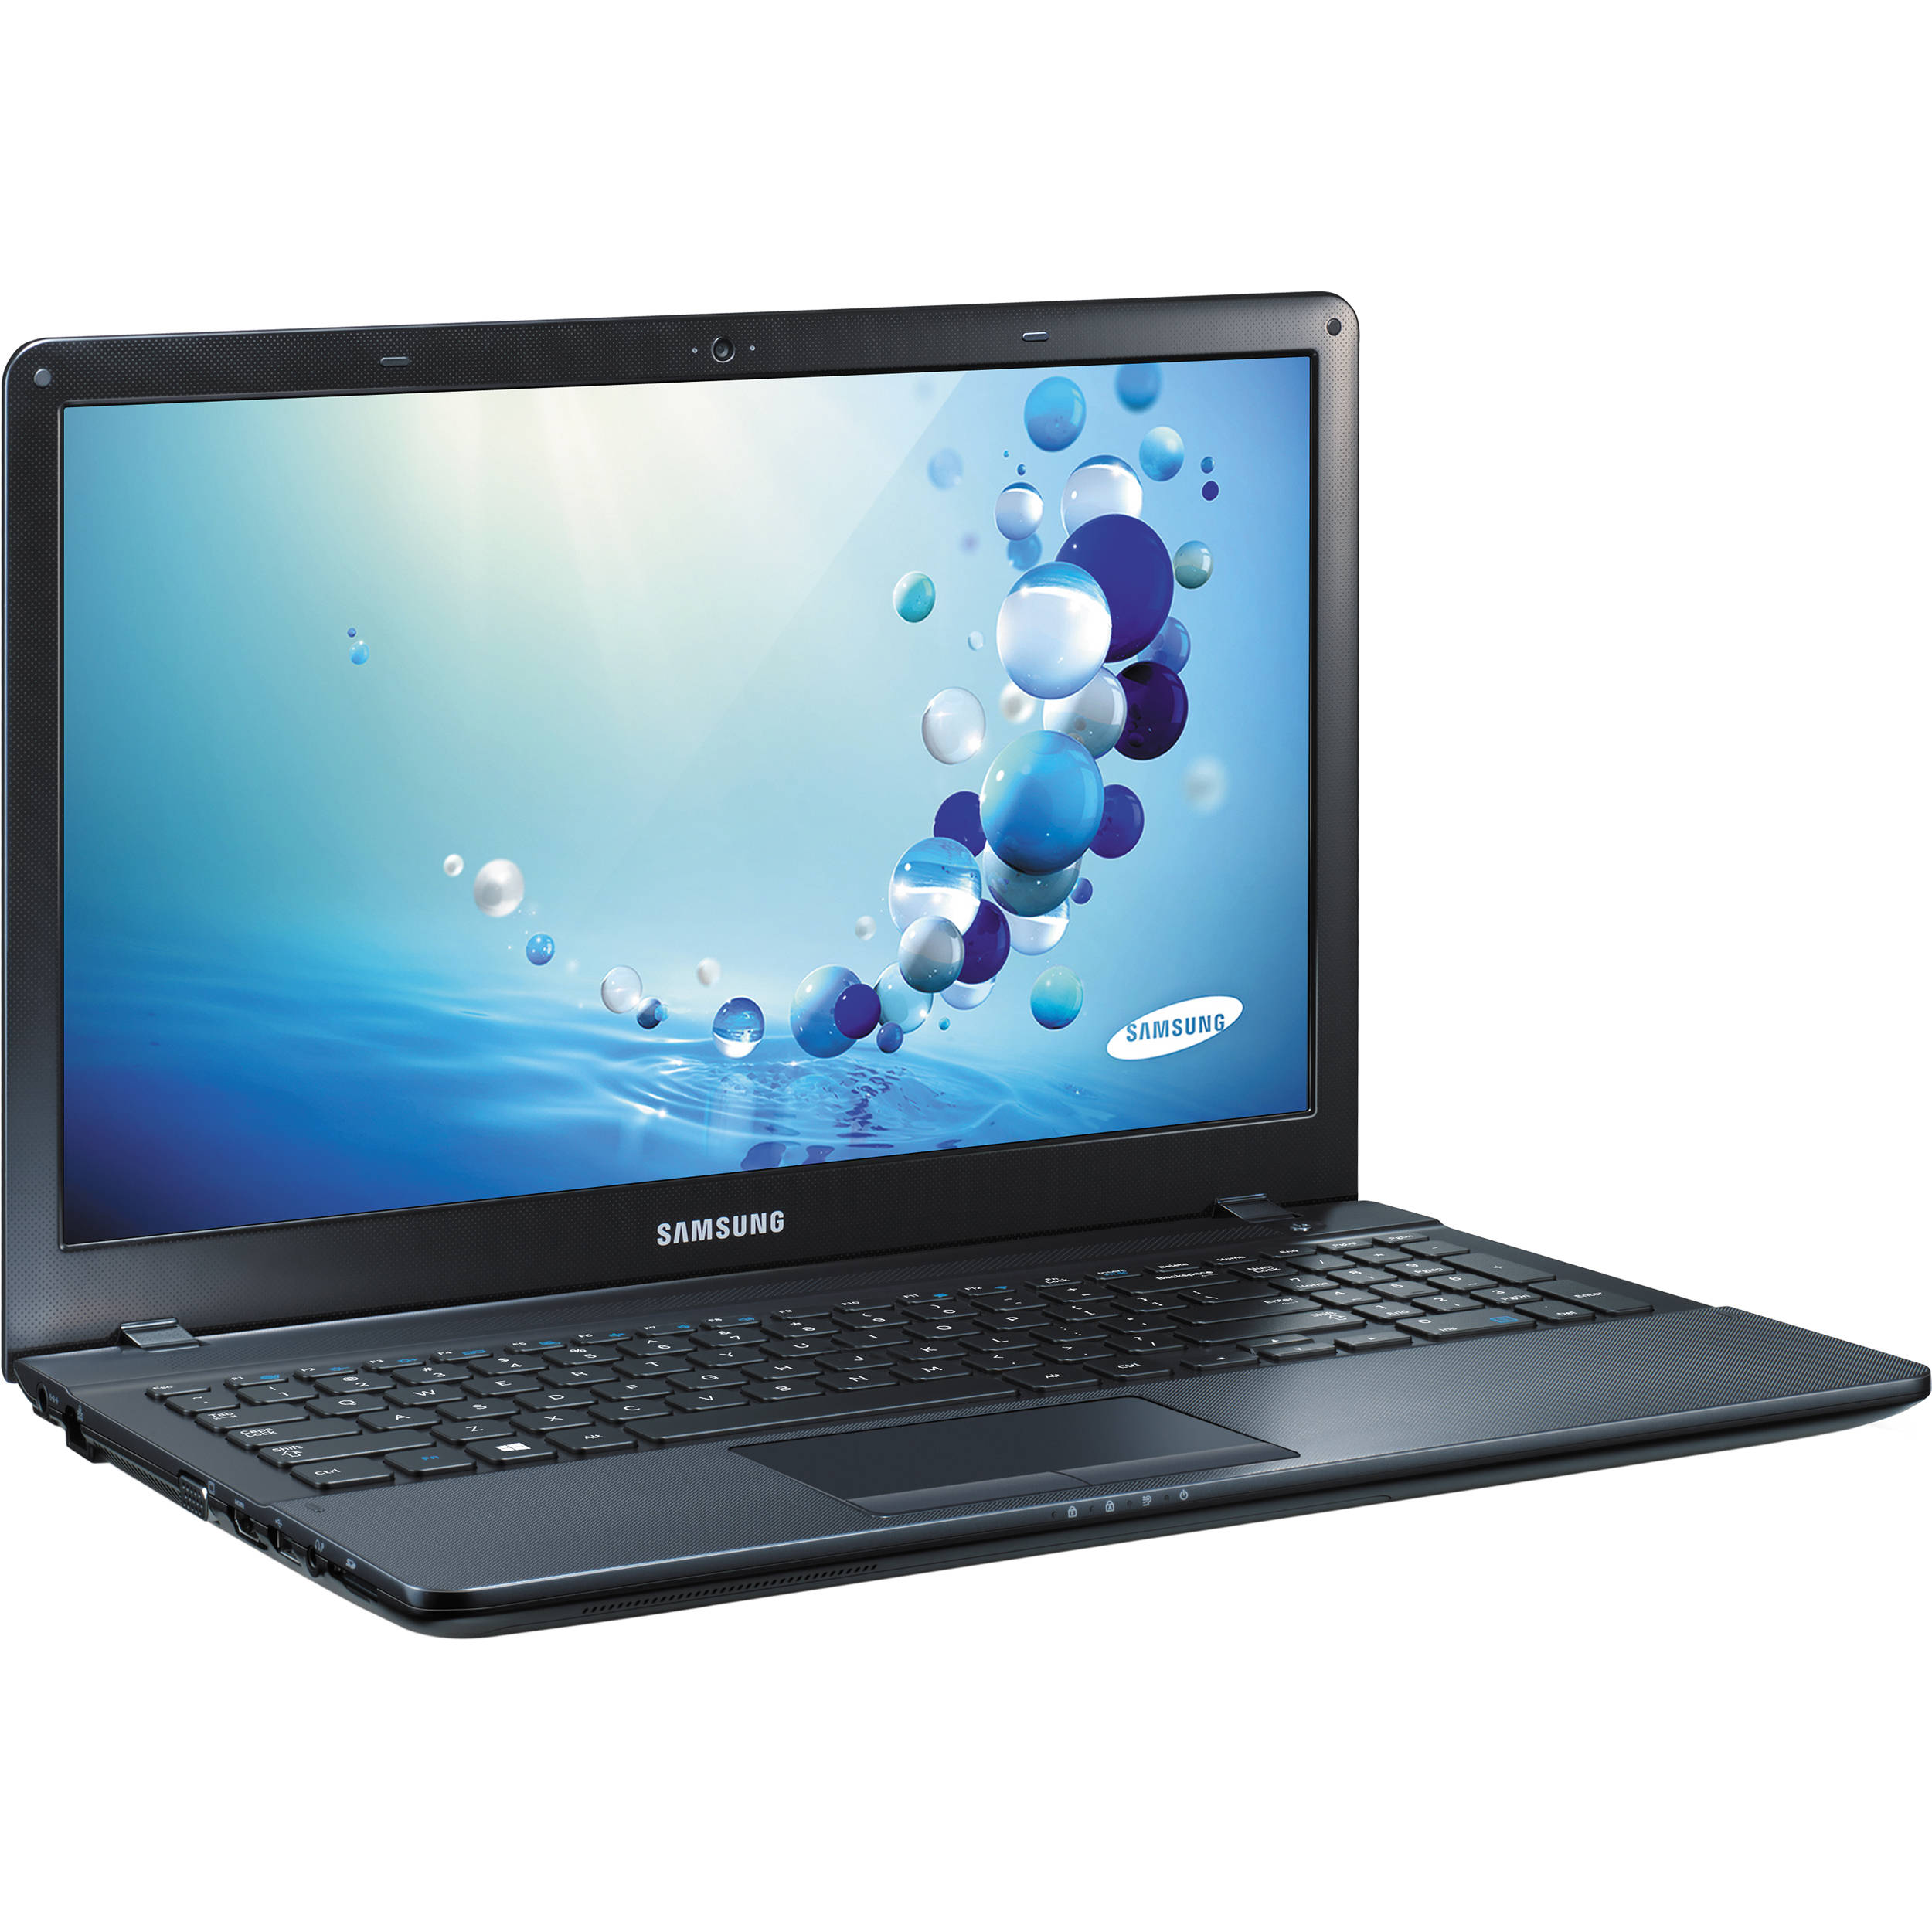 Notebook samsung core i5 8gb 1tb - Samsung Ativ Book 2 Np270e5j K01us 15 6 Notebook Computer Mineral Ash Black